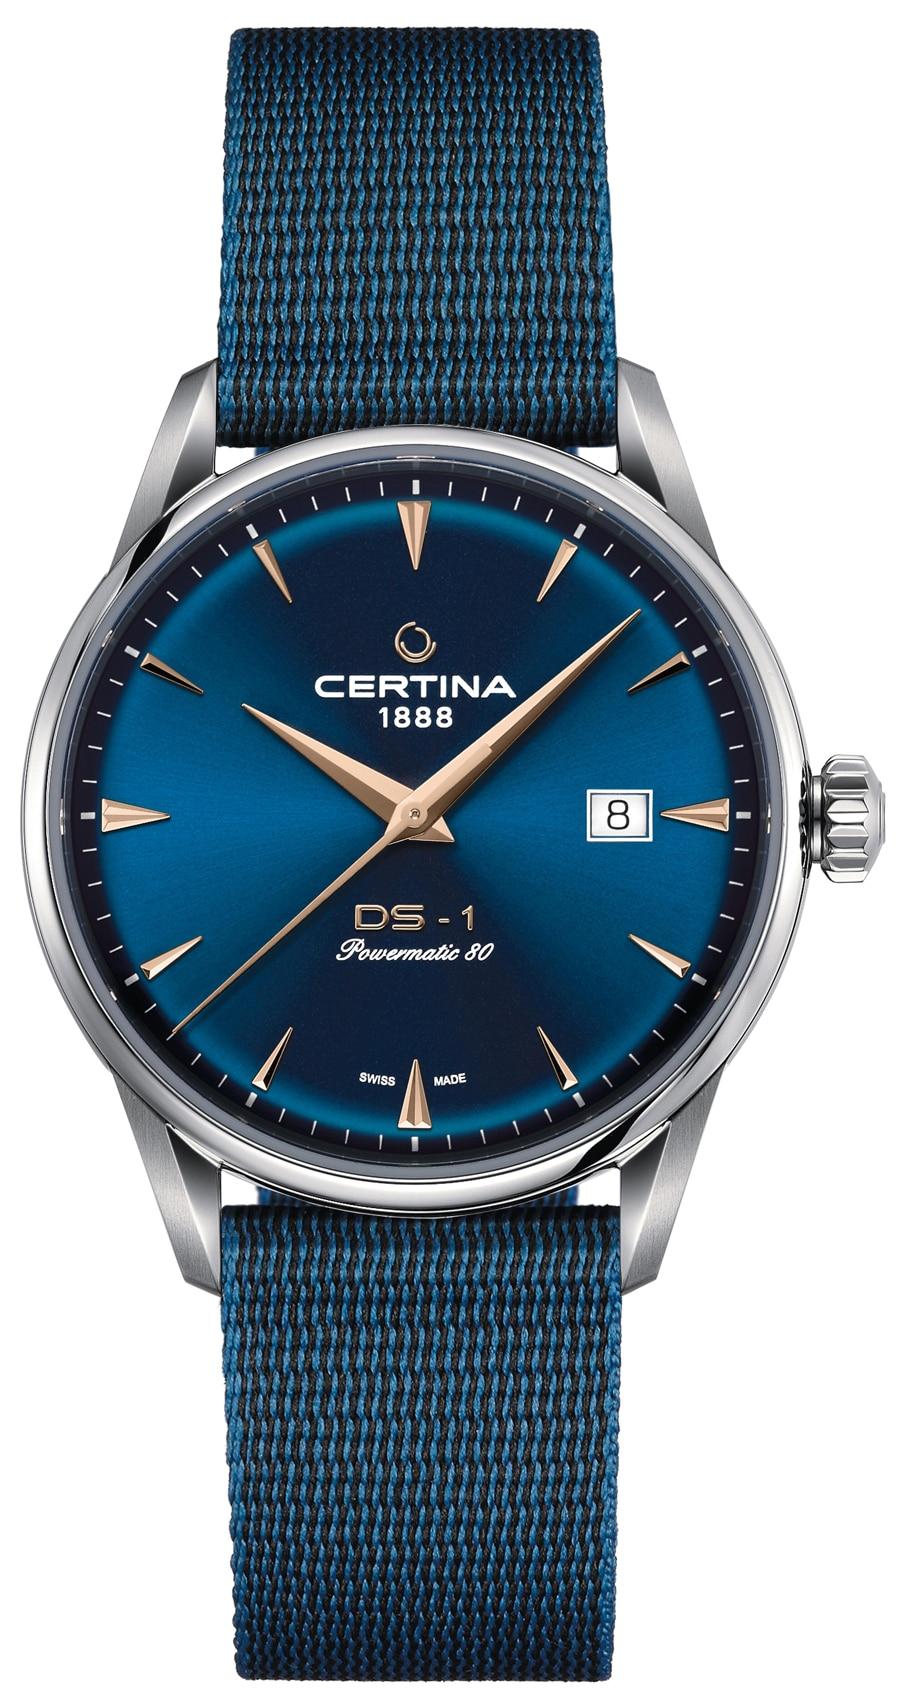 Certina: DS-1 Powermatic 80 blaues Textilband aus #tide ocean material® mit Dornschließe